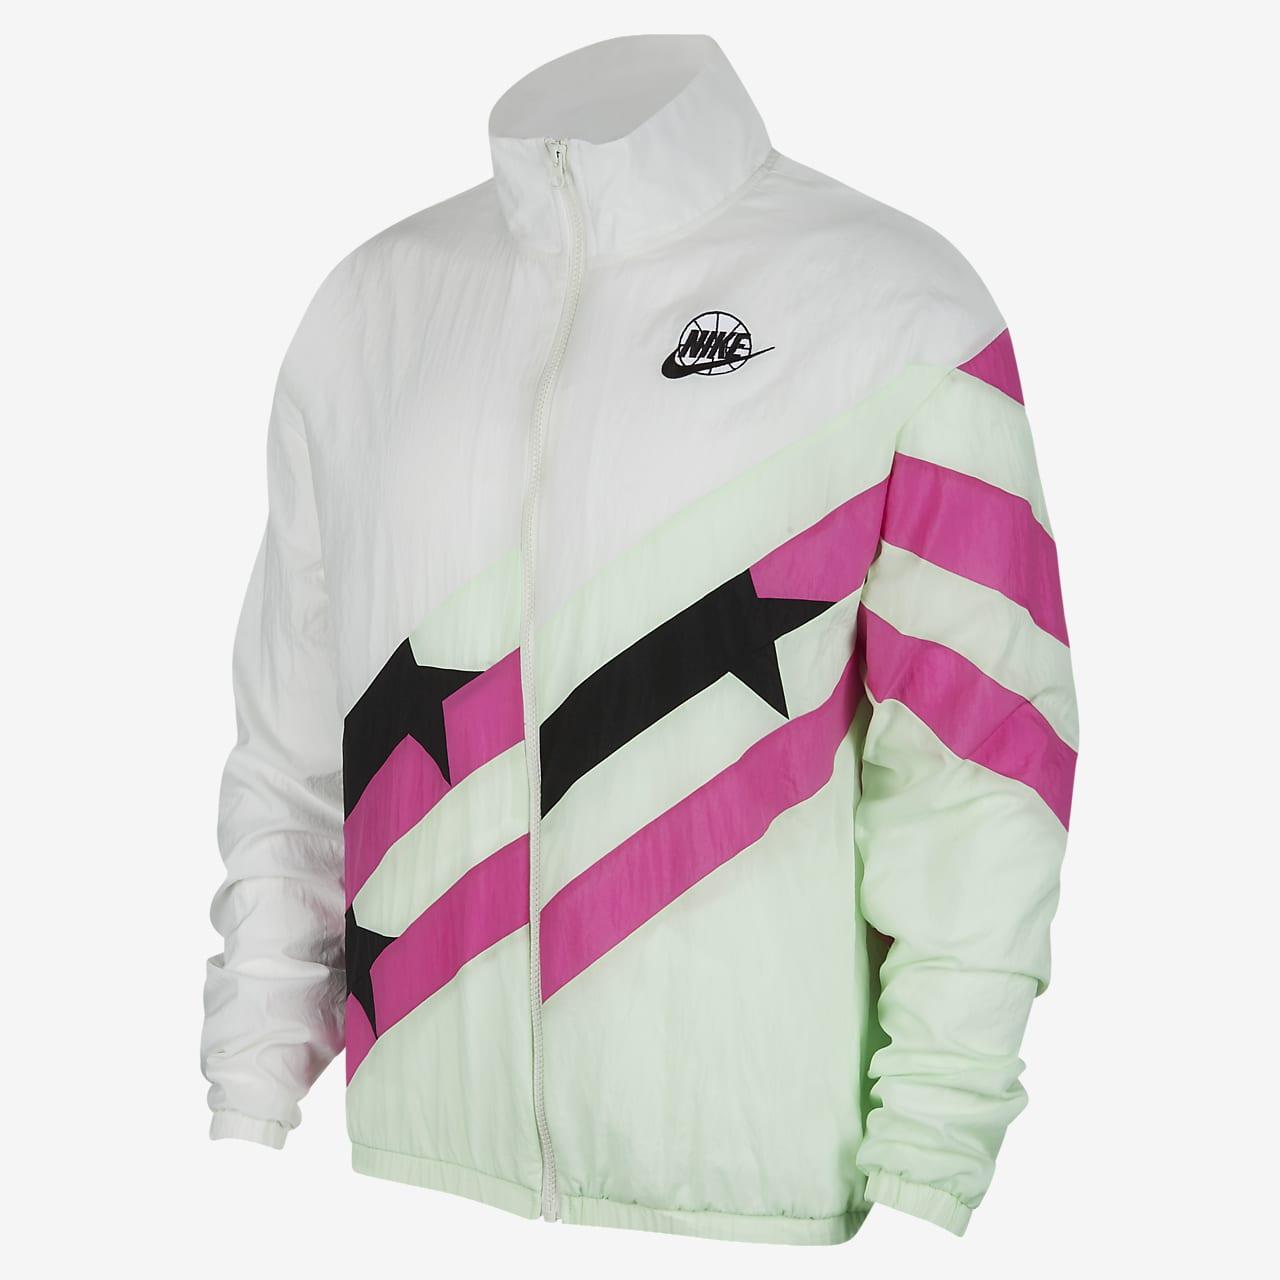 Nike Throwback Men's Basketball Tracksuit Jacket